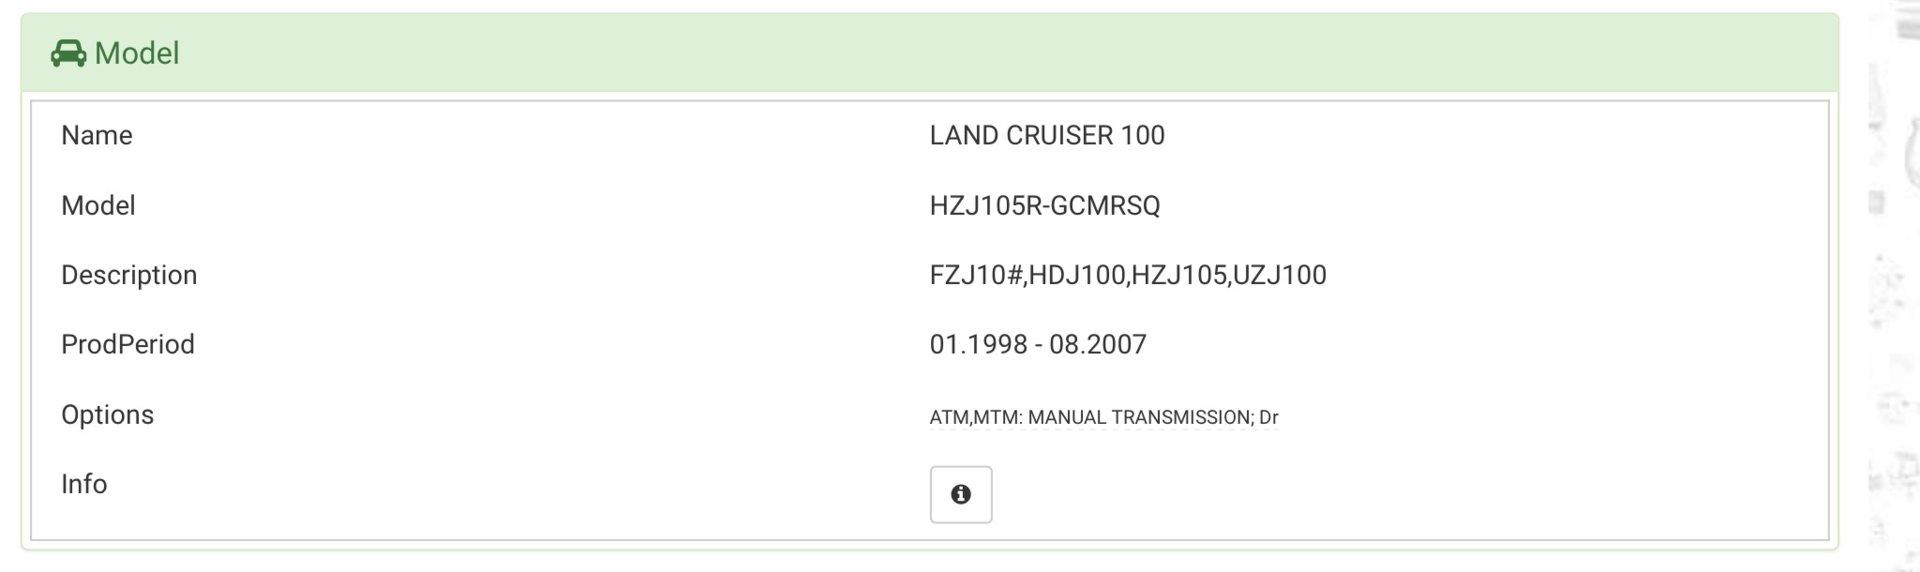 D940CAAD-B6F2-435C-9832-967EBE44A39A.jpeg